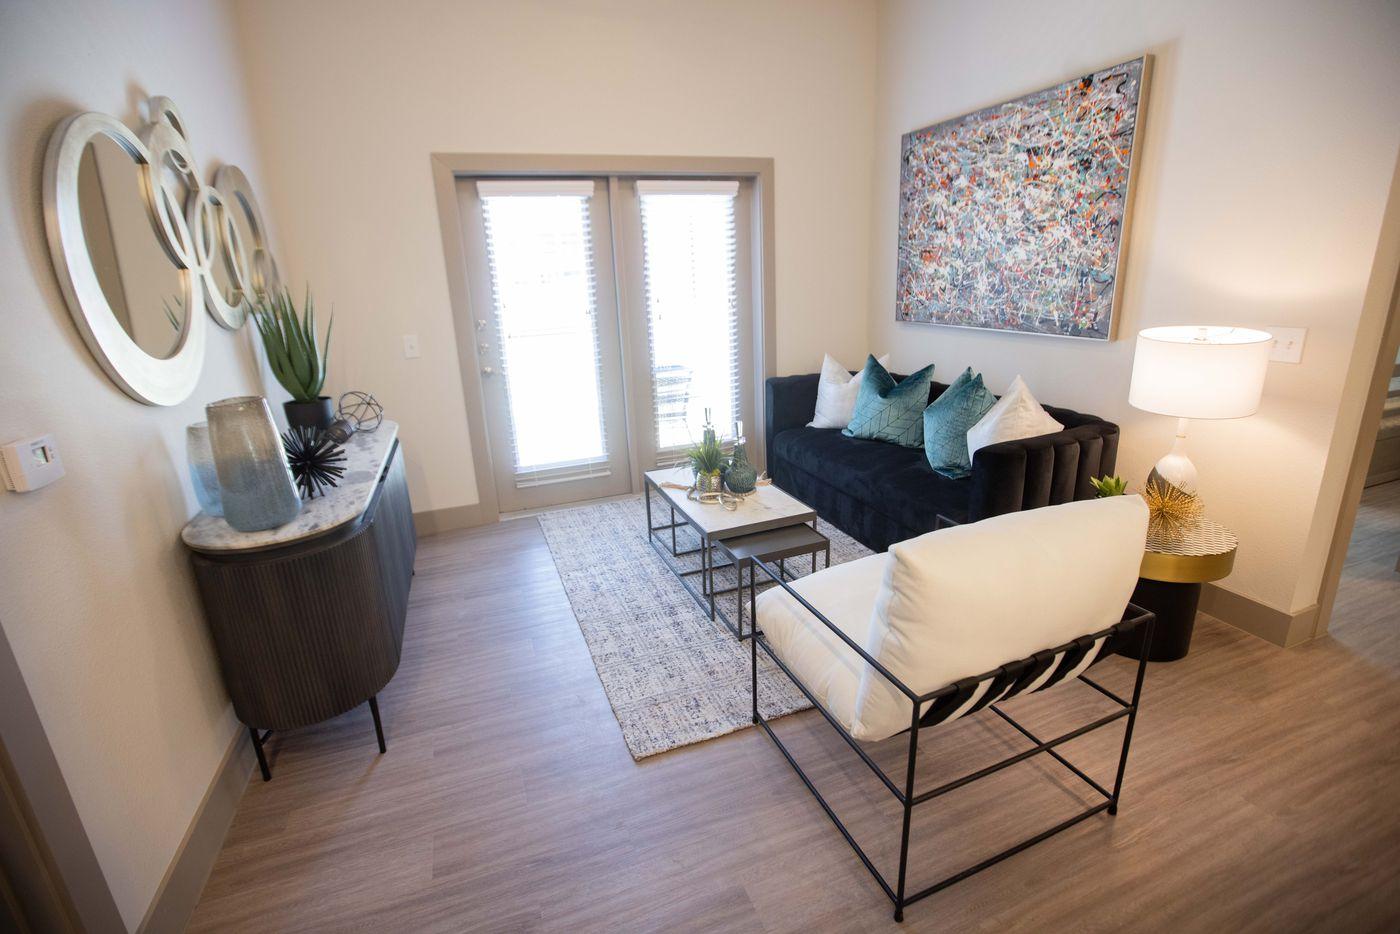 A living area in a model apartment at Palladium RedBird apartments.